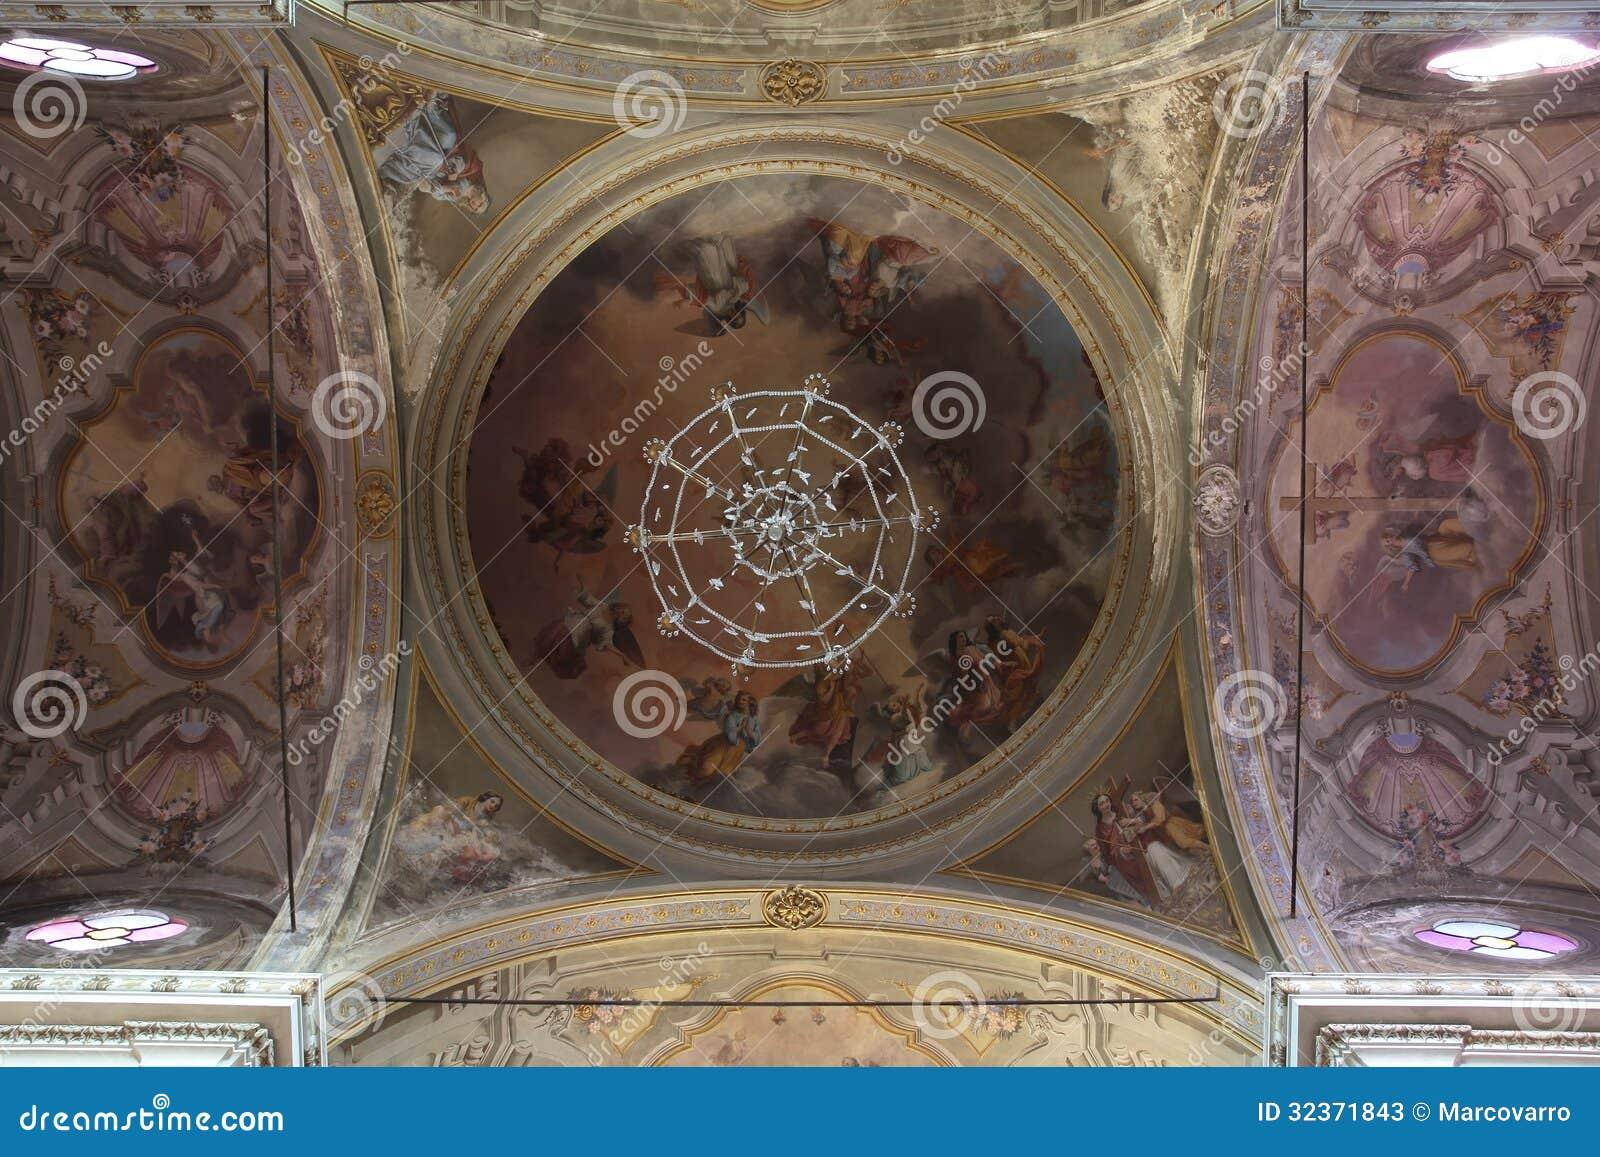 Fresco ceiling tile integralbook baroque ceiling tile gallery flooring design ideas dailygadgetfo Image collections